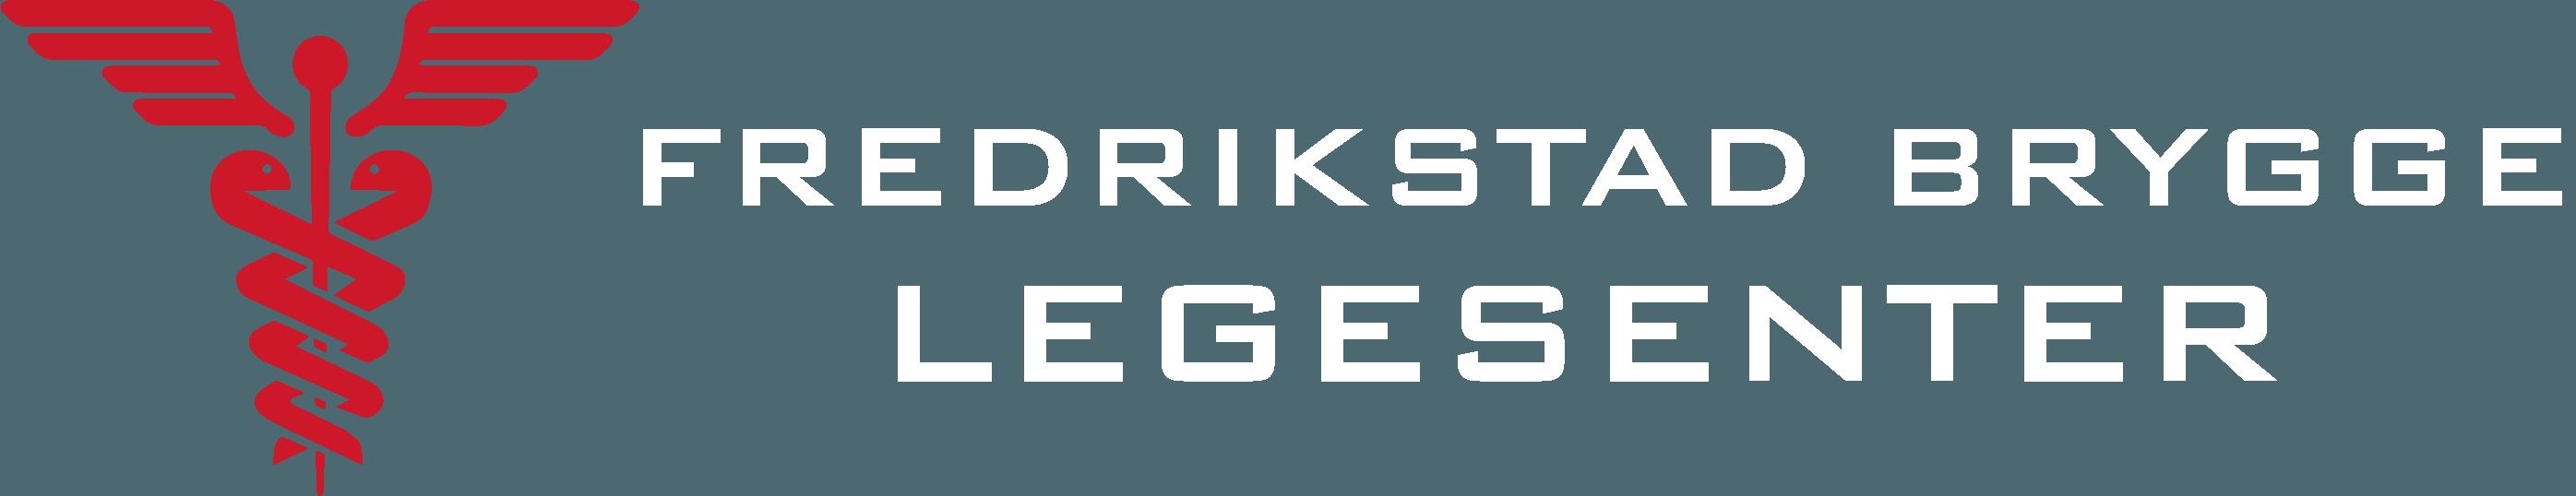 Fredrikstad Brygge